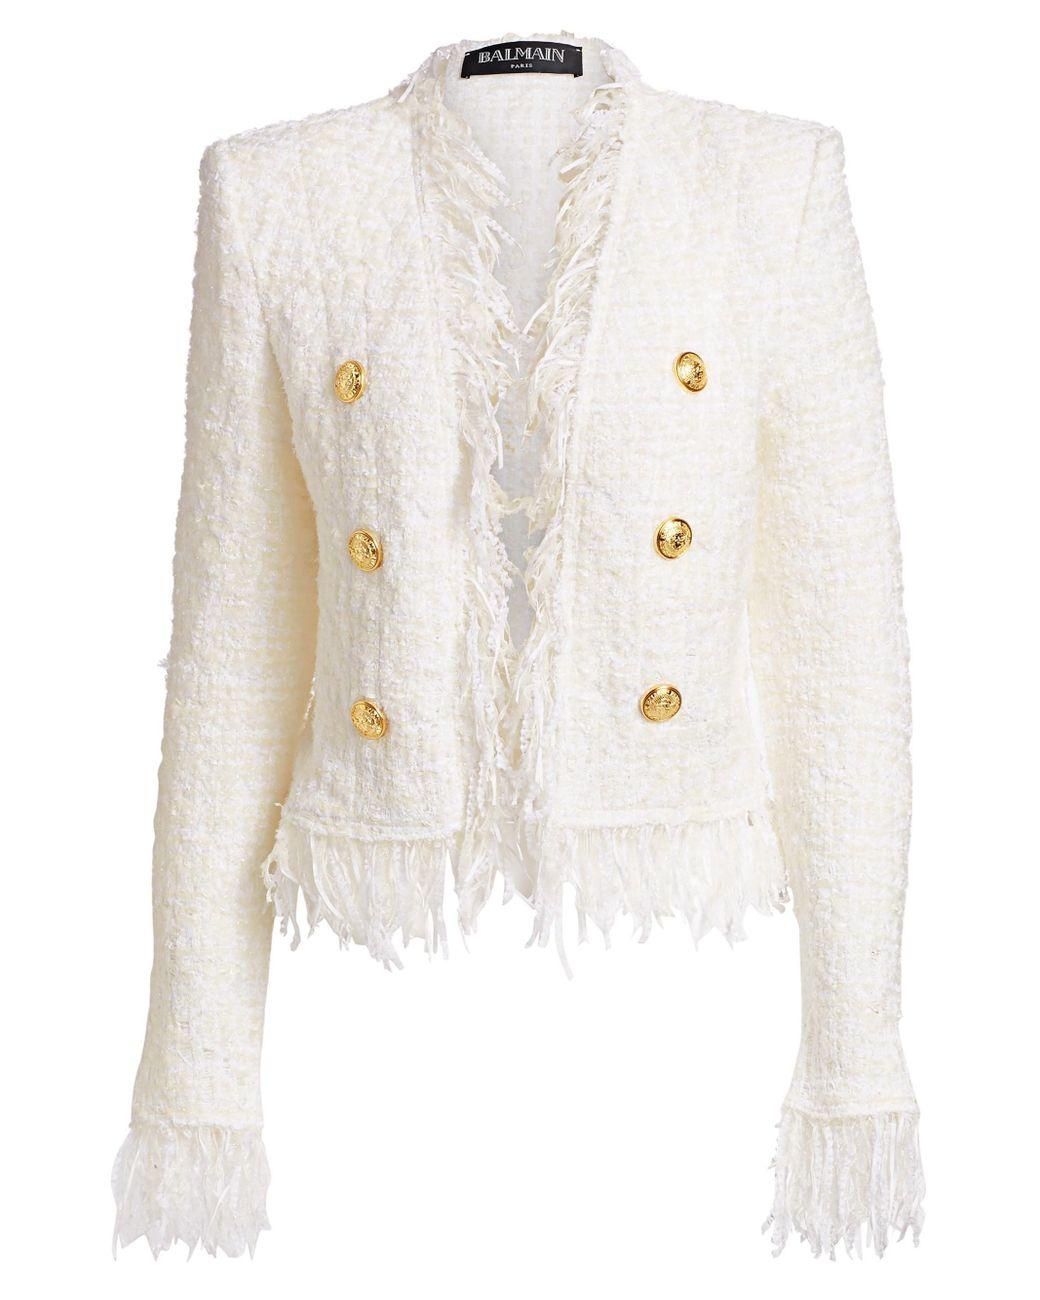 0aad2fe8 Balmain Women's Short Fringe Tweed Jacket - White in White - Save 41% - Lyst